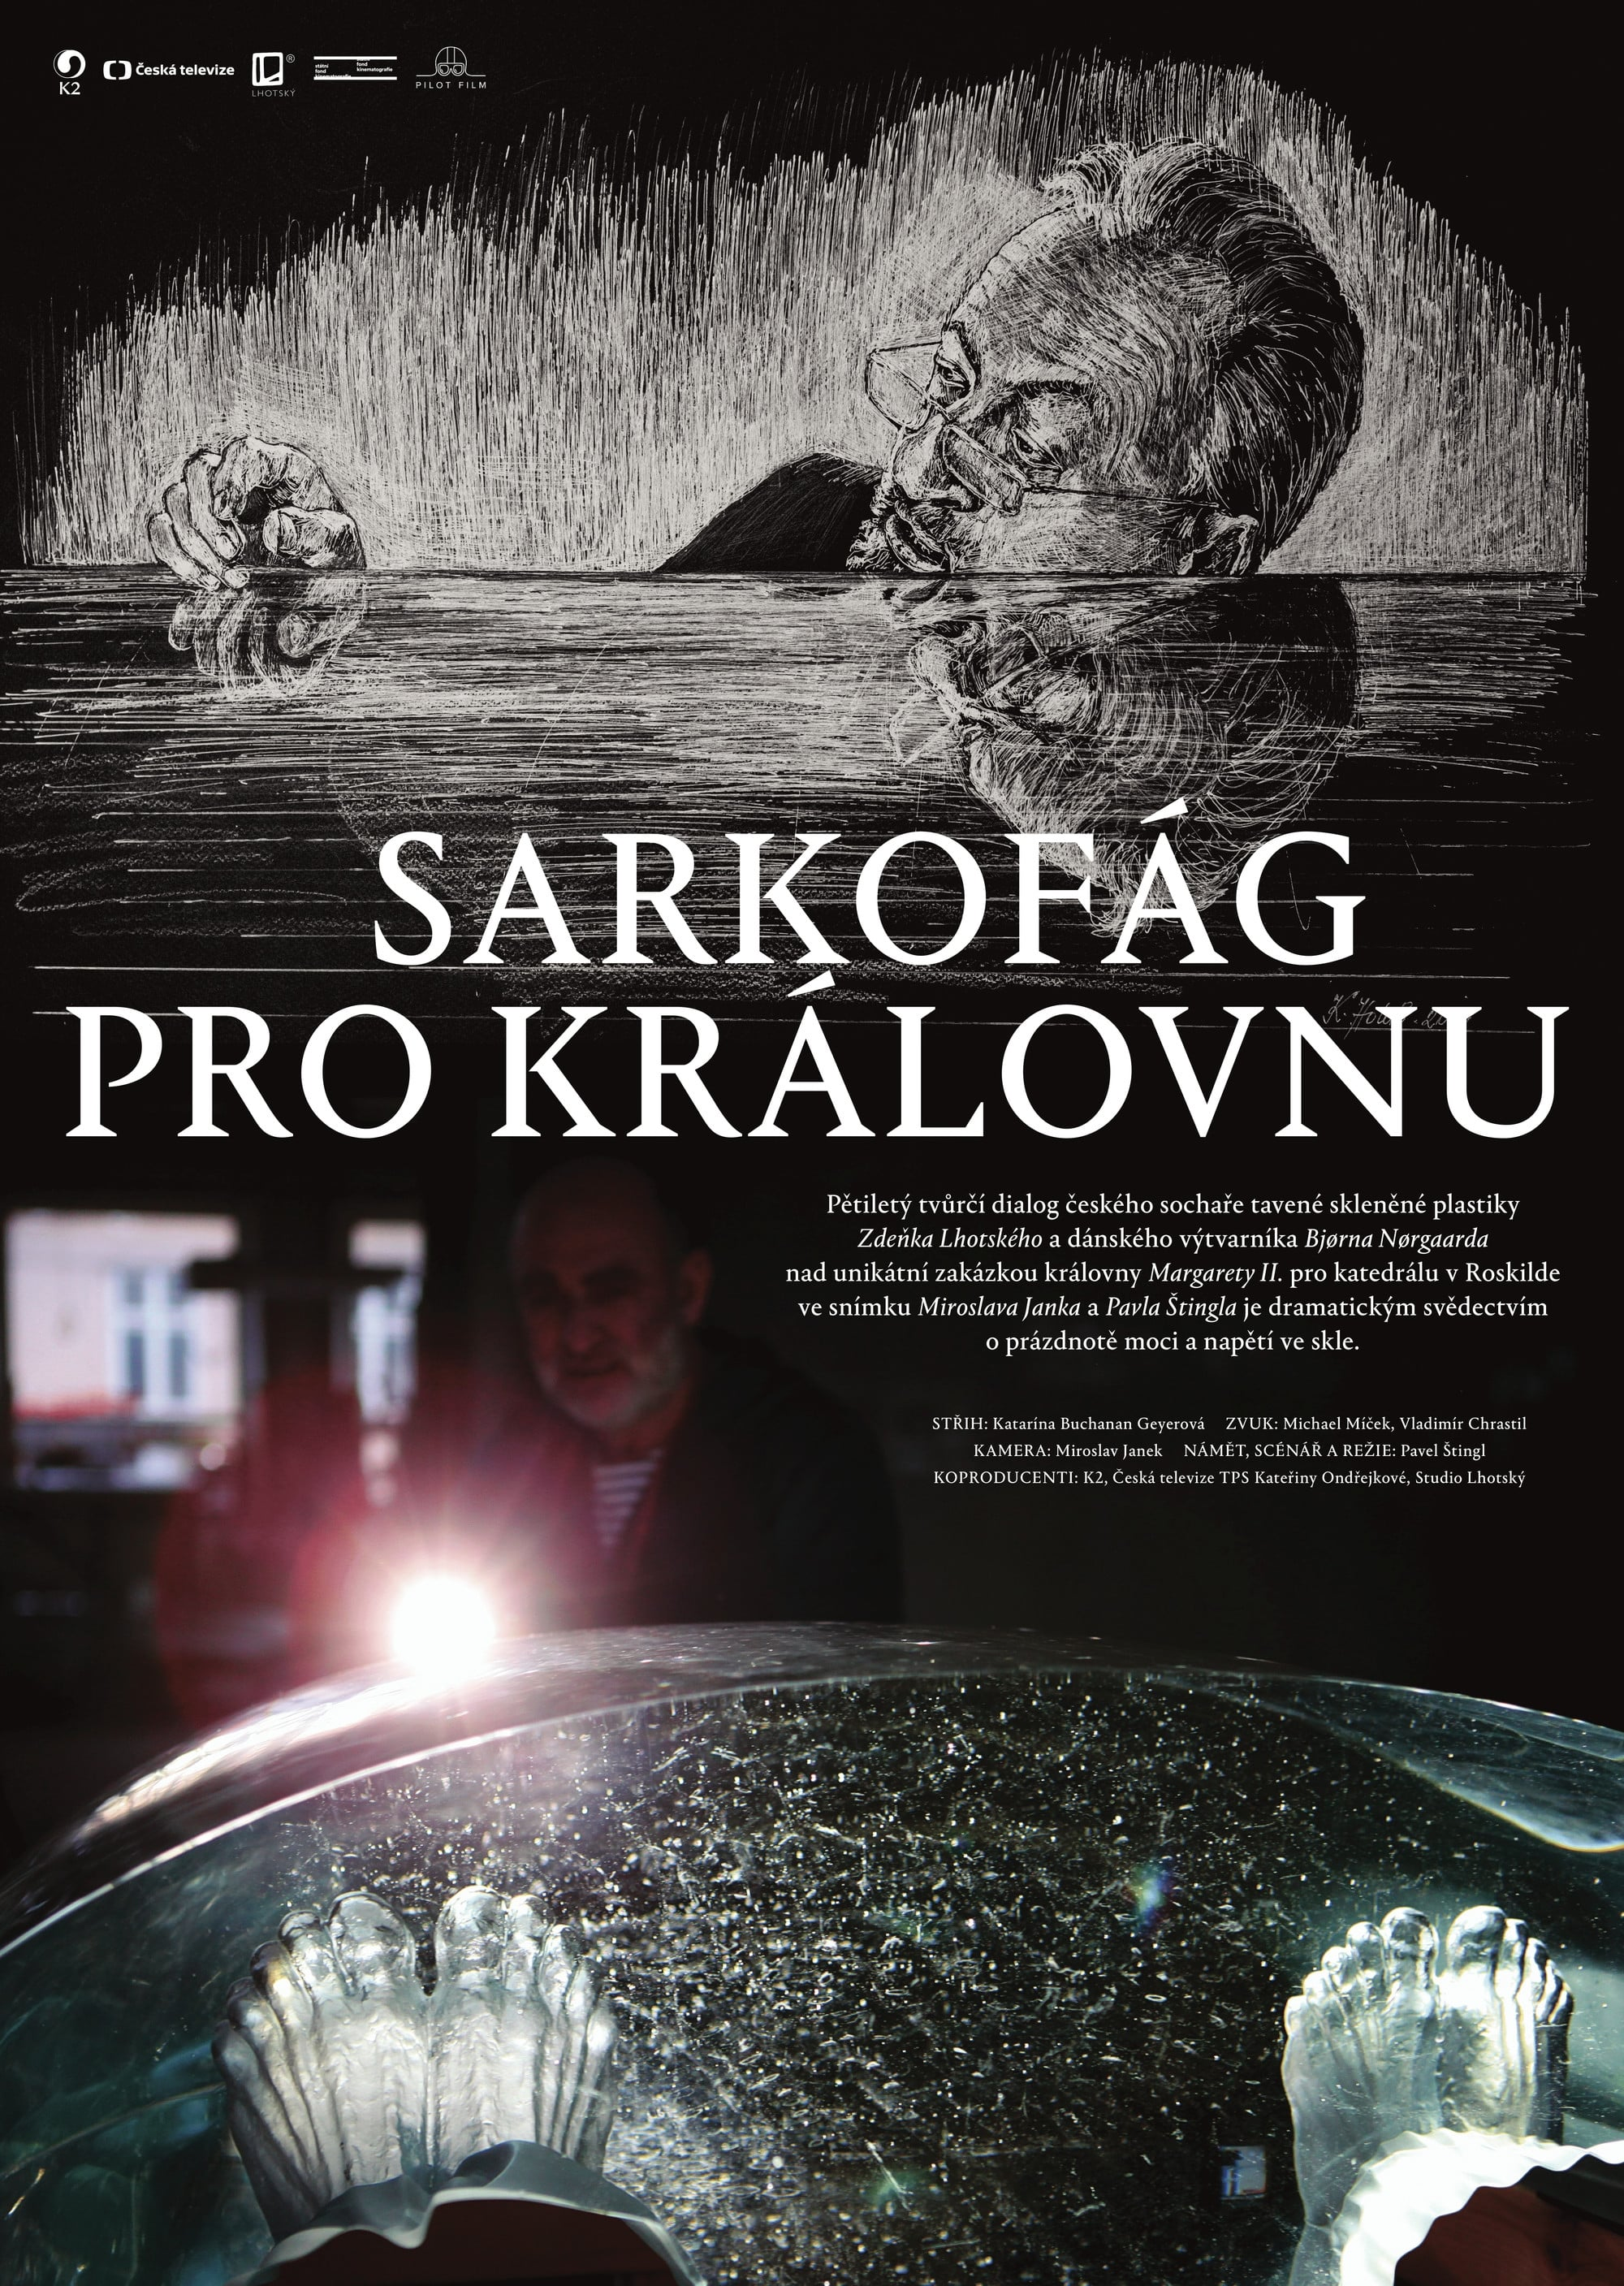 Sarcophagus for a Queen (2019)